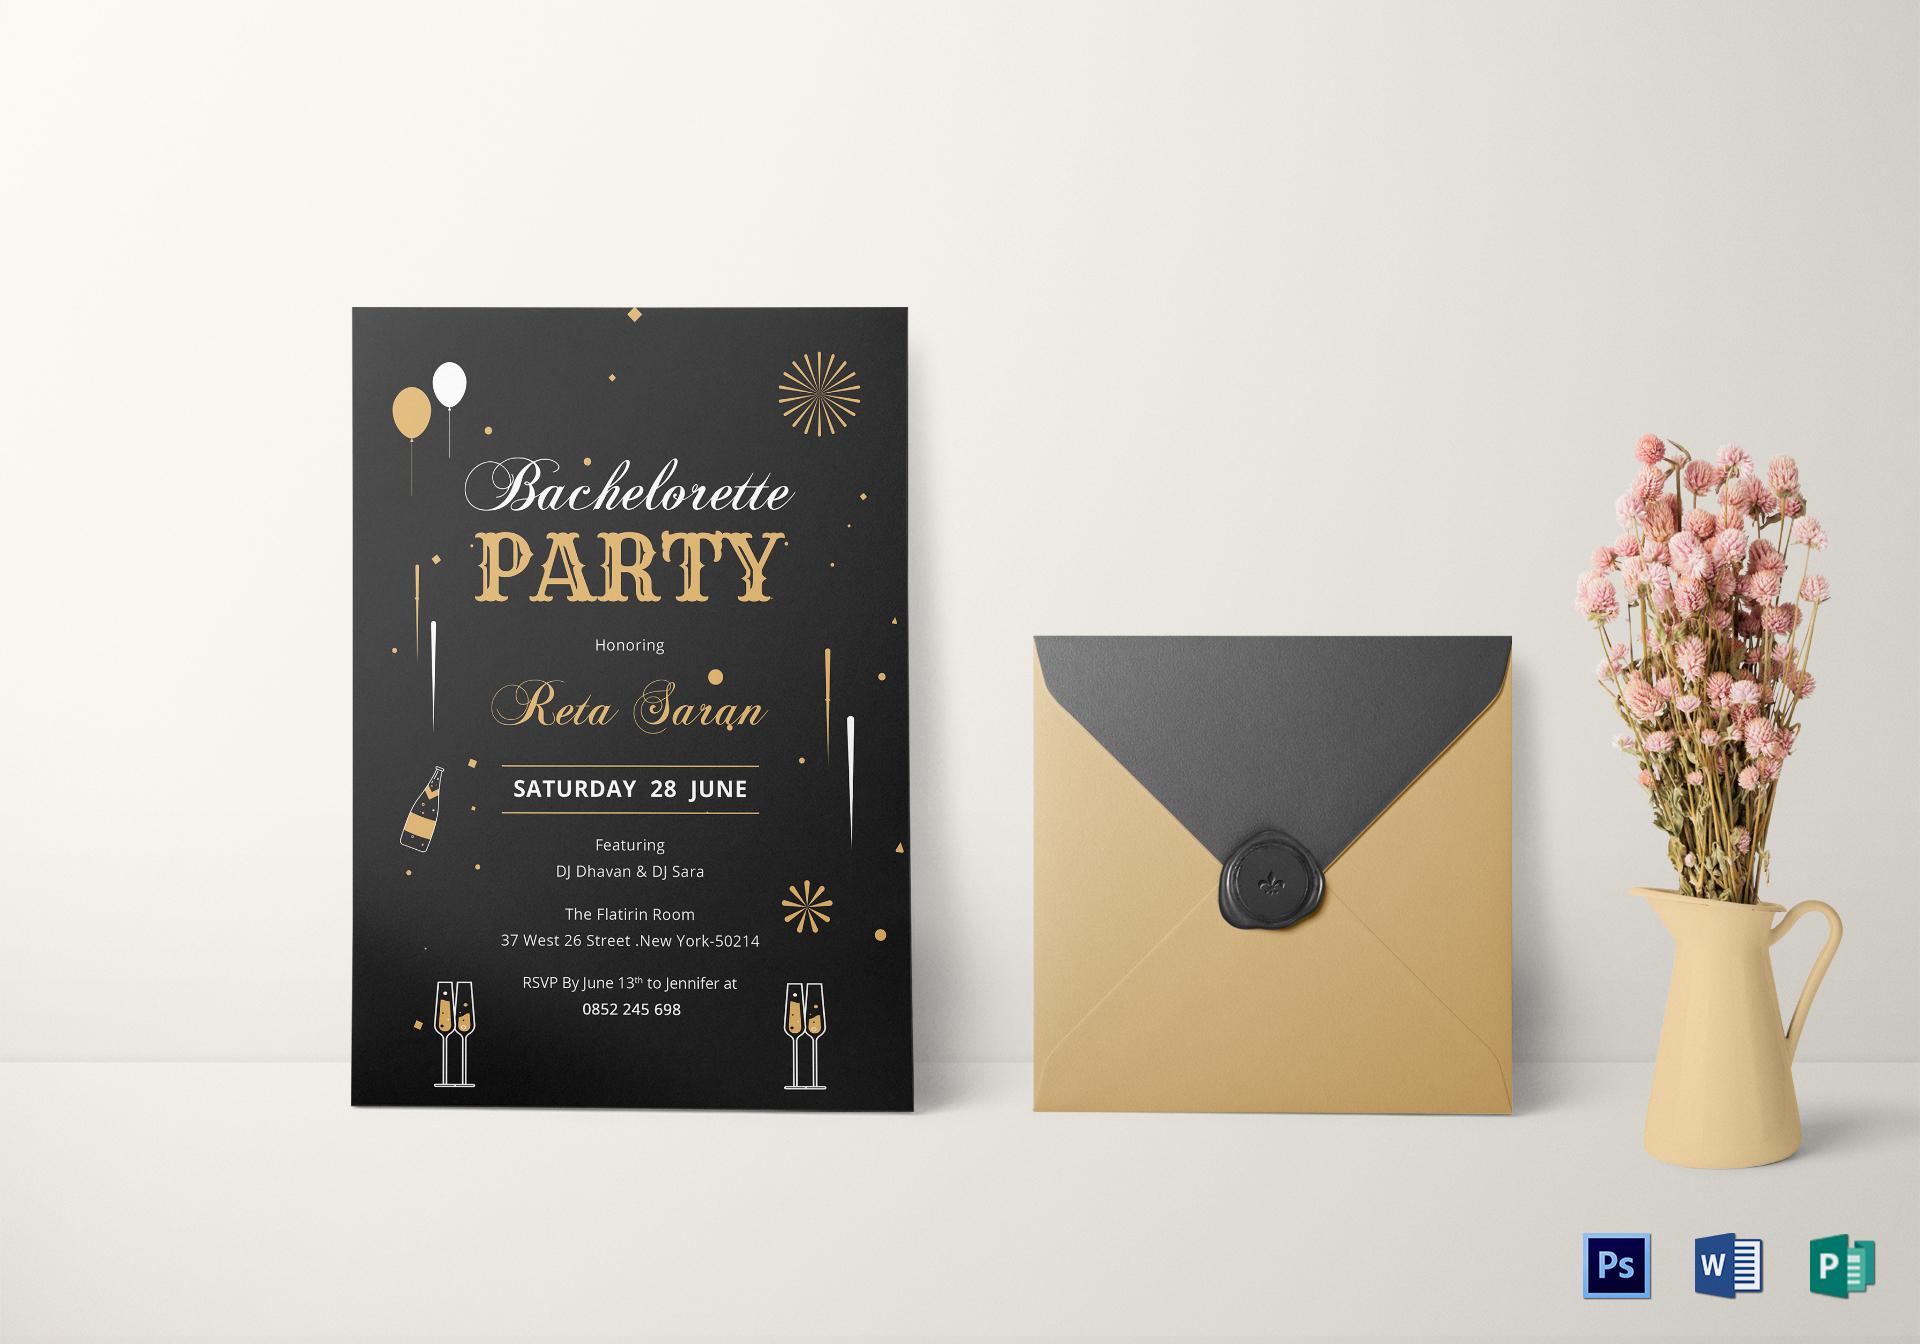 Bachelorette Party Invitation Card Template